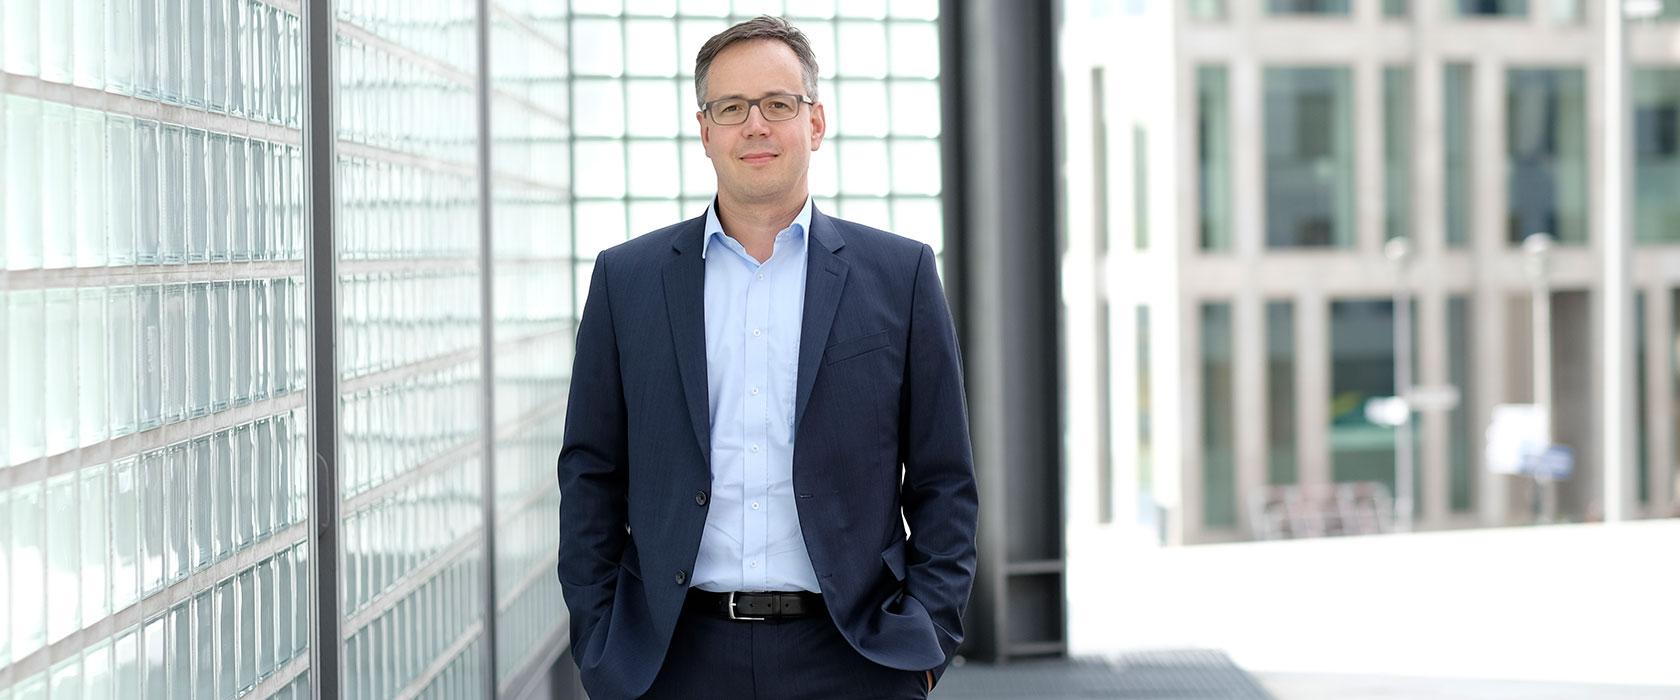 Jörg Oehmig: Honorarberater für die Geldanlage in Mannheim